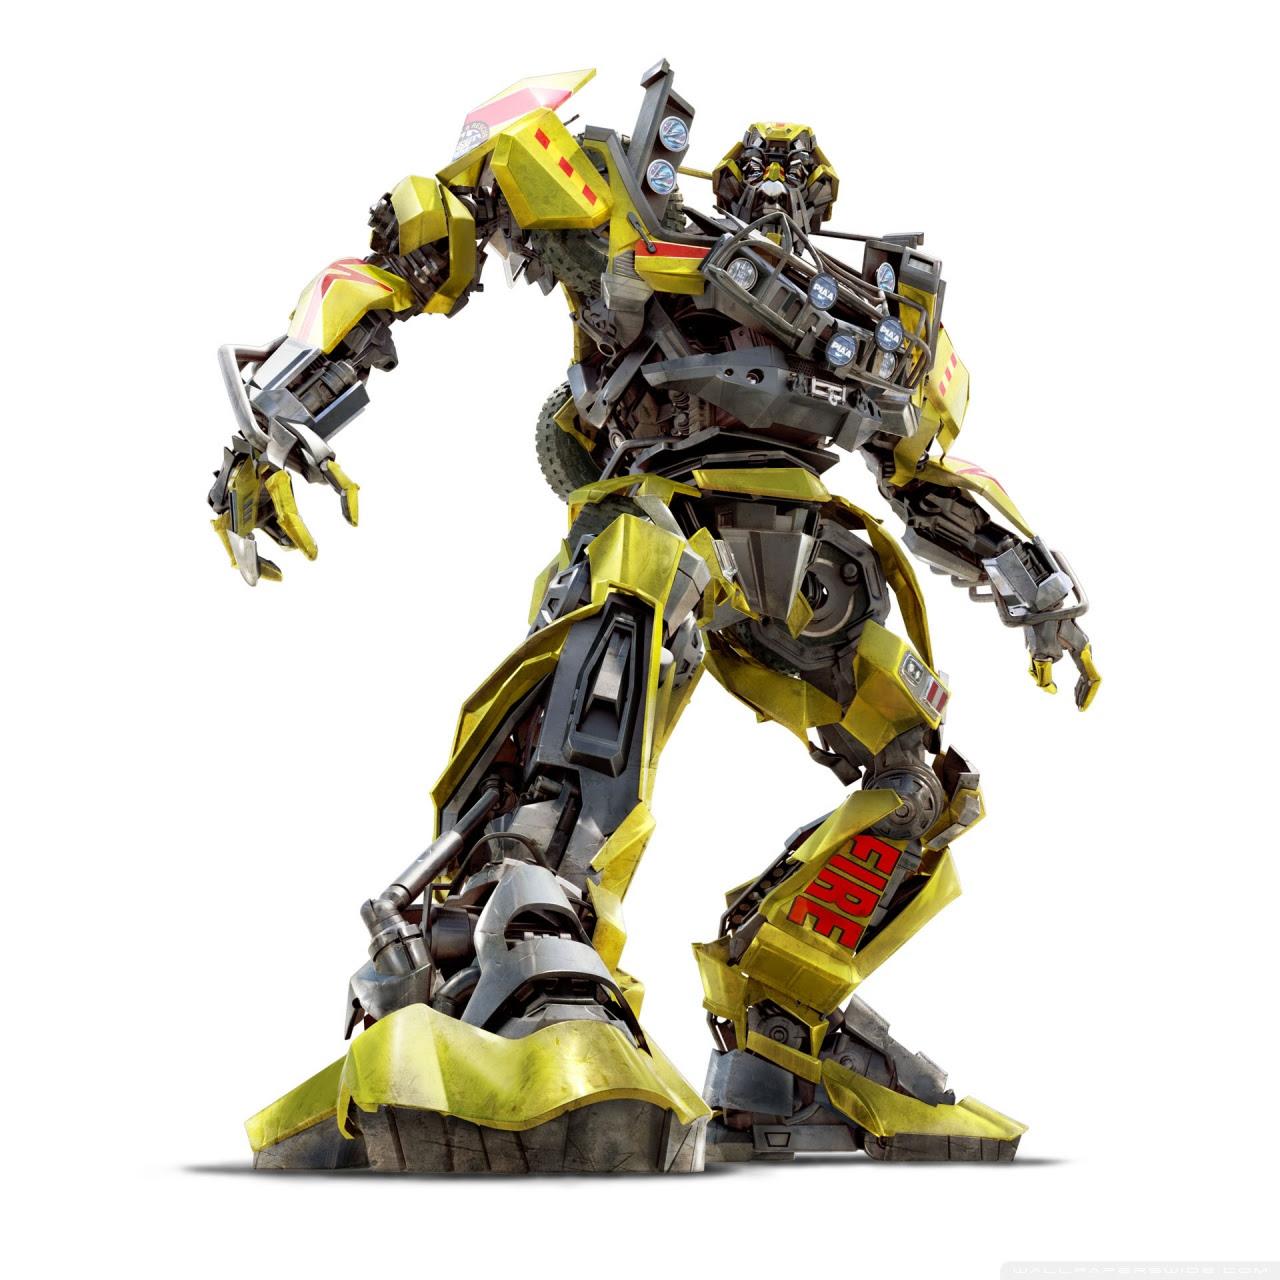 Transformers Robot Ultra HD Desktop Background Wallpaper For